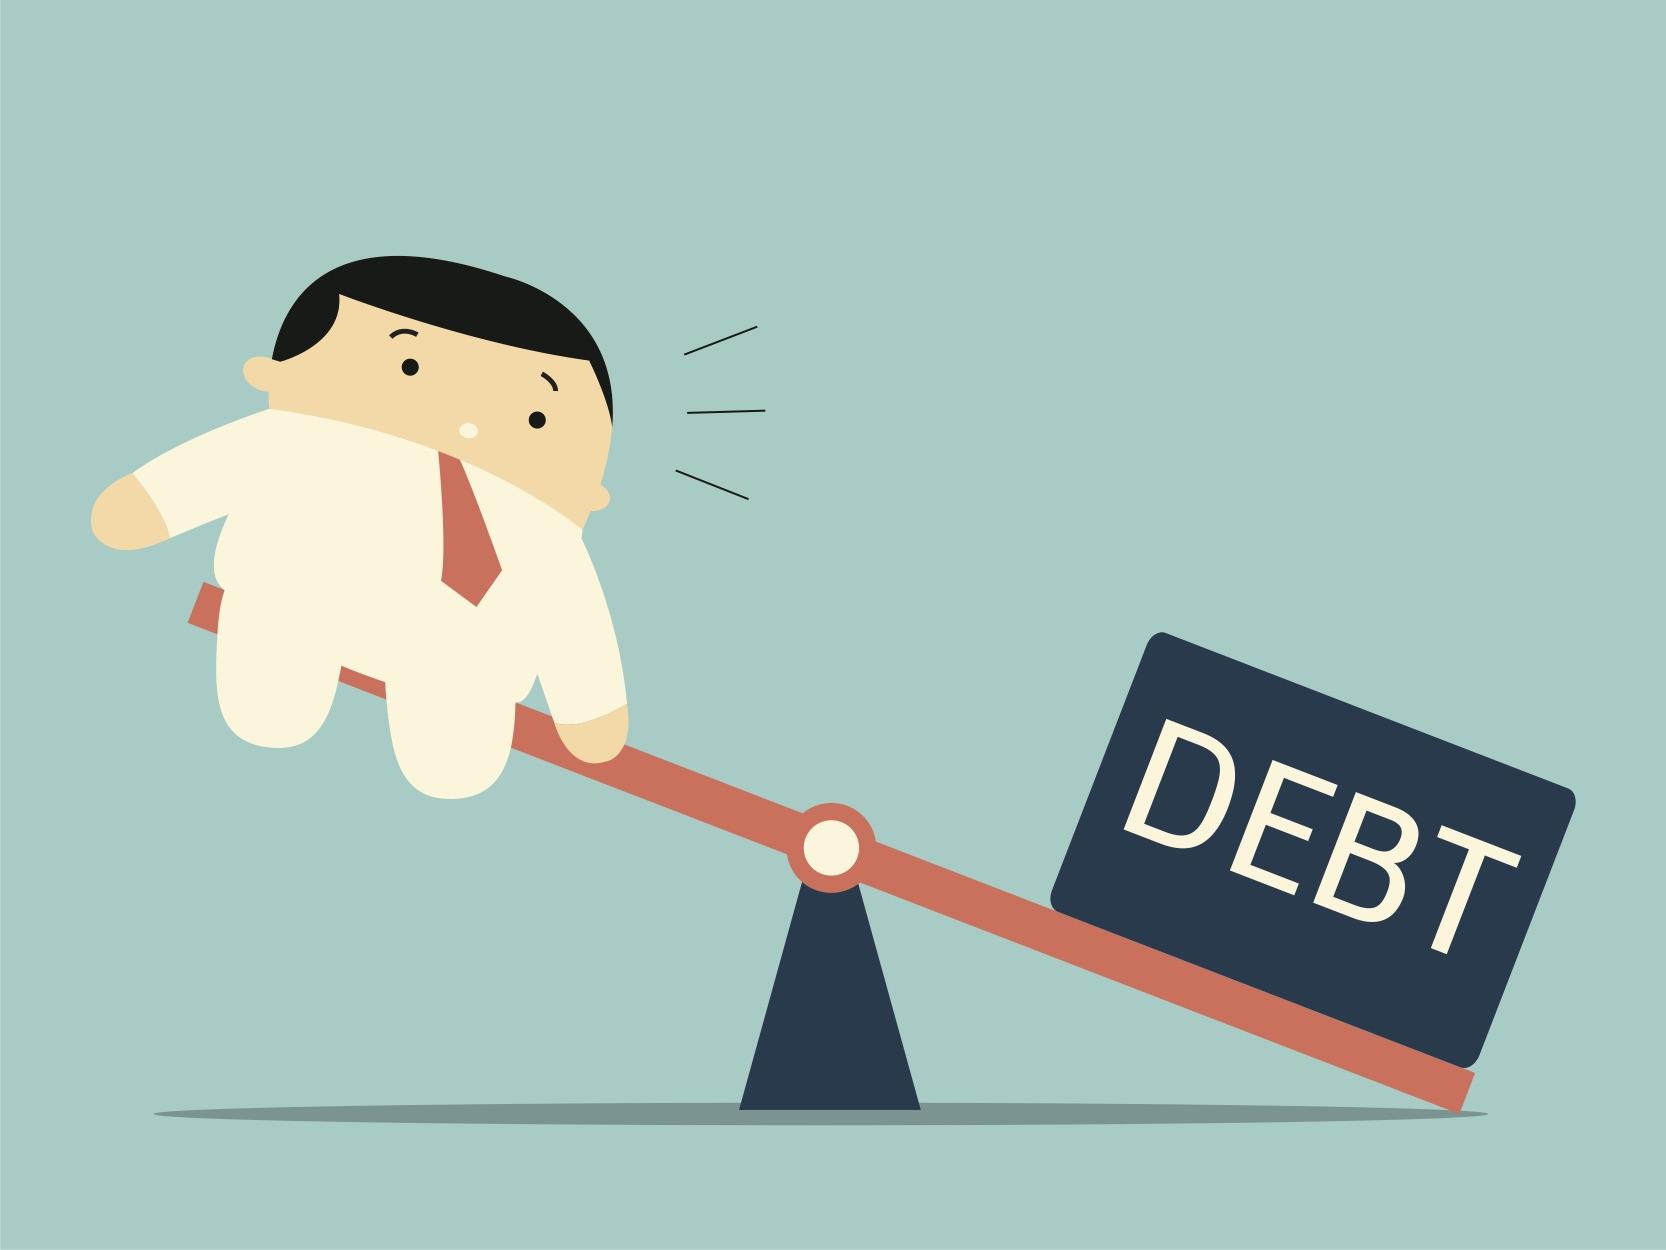 Stop Debt Collectors Mainly an Abusive Debt Collector